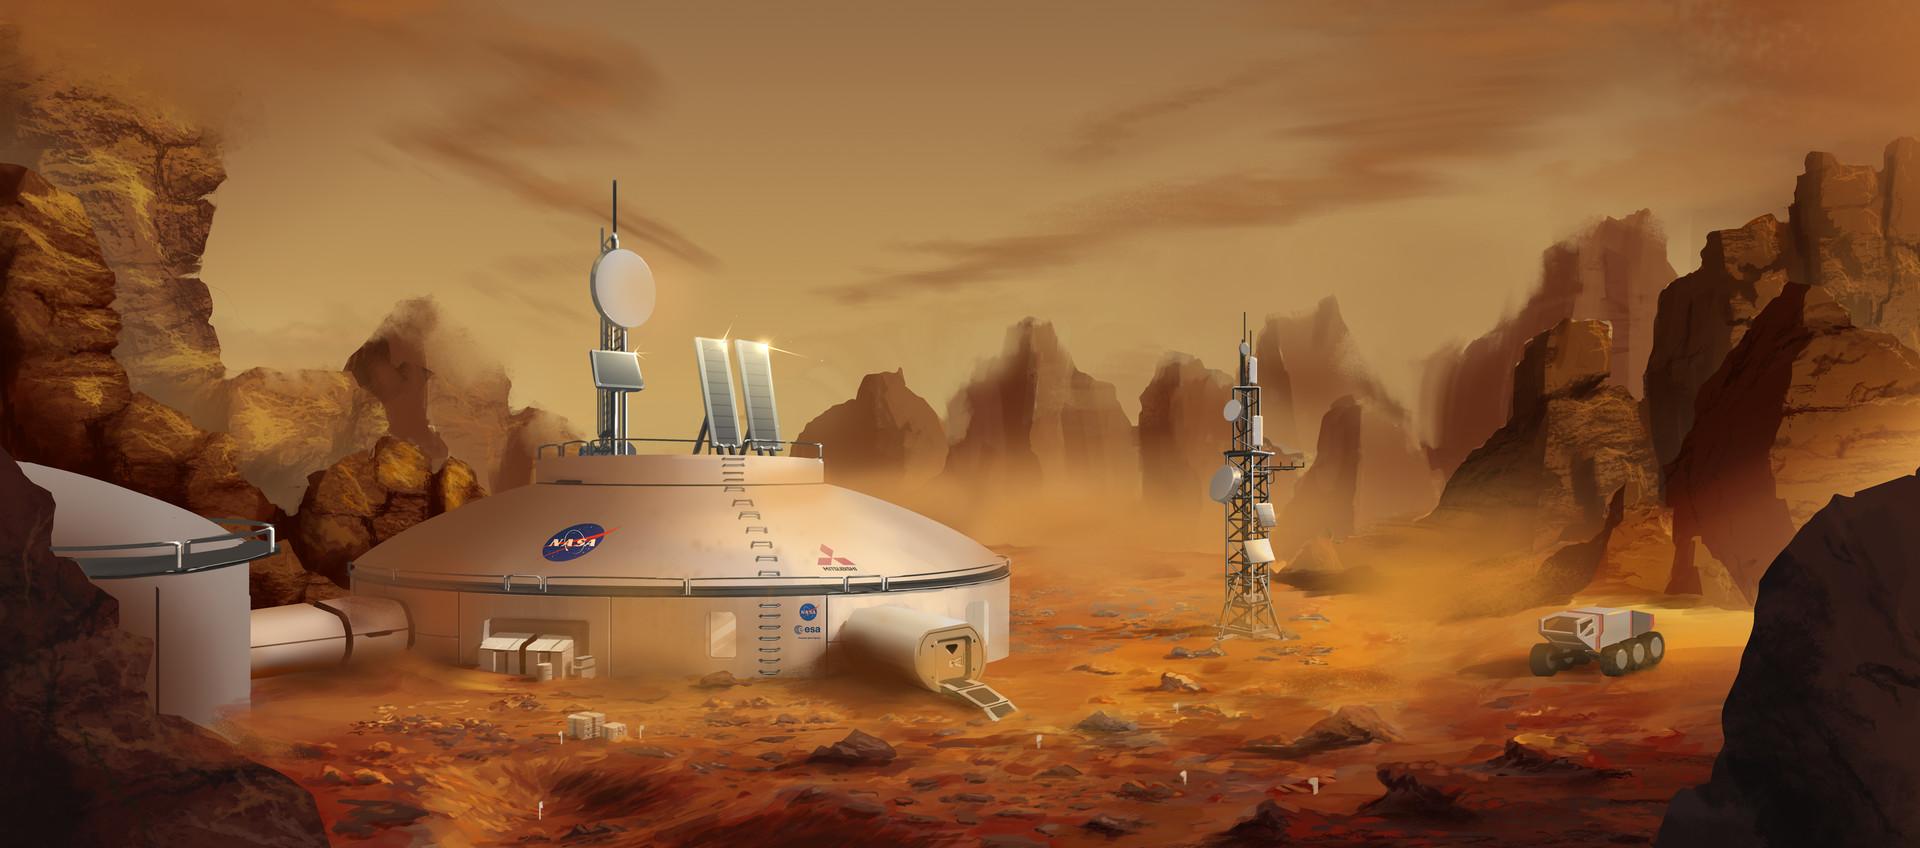 human Mars: NASA's Mars base concept by Alexey Rubakin